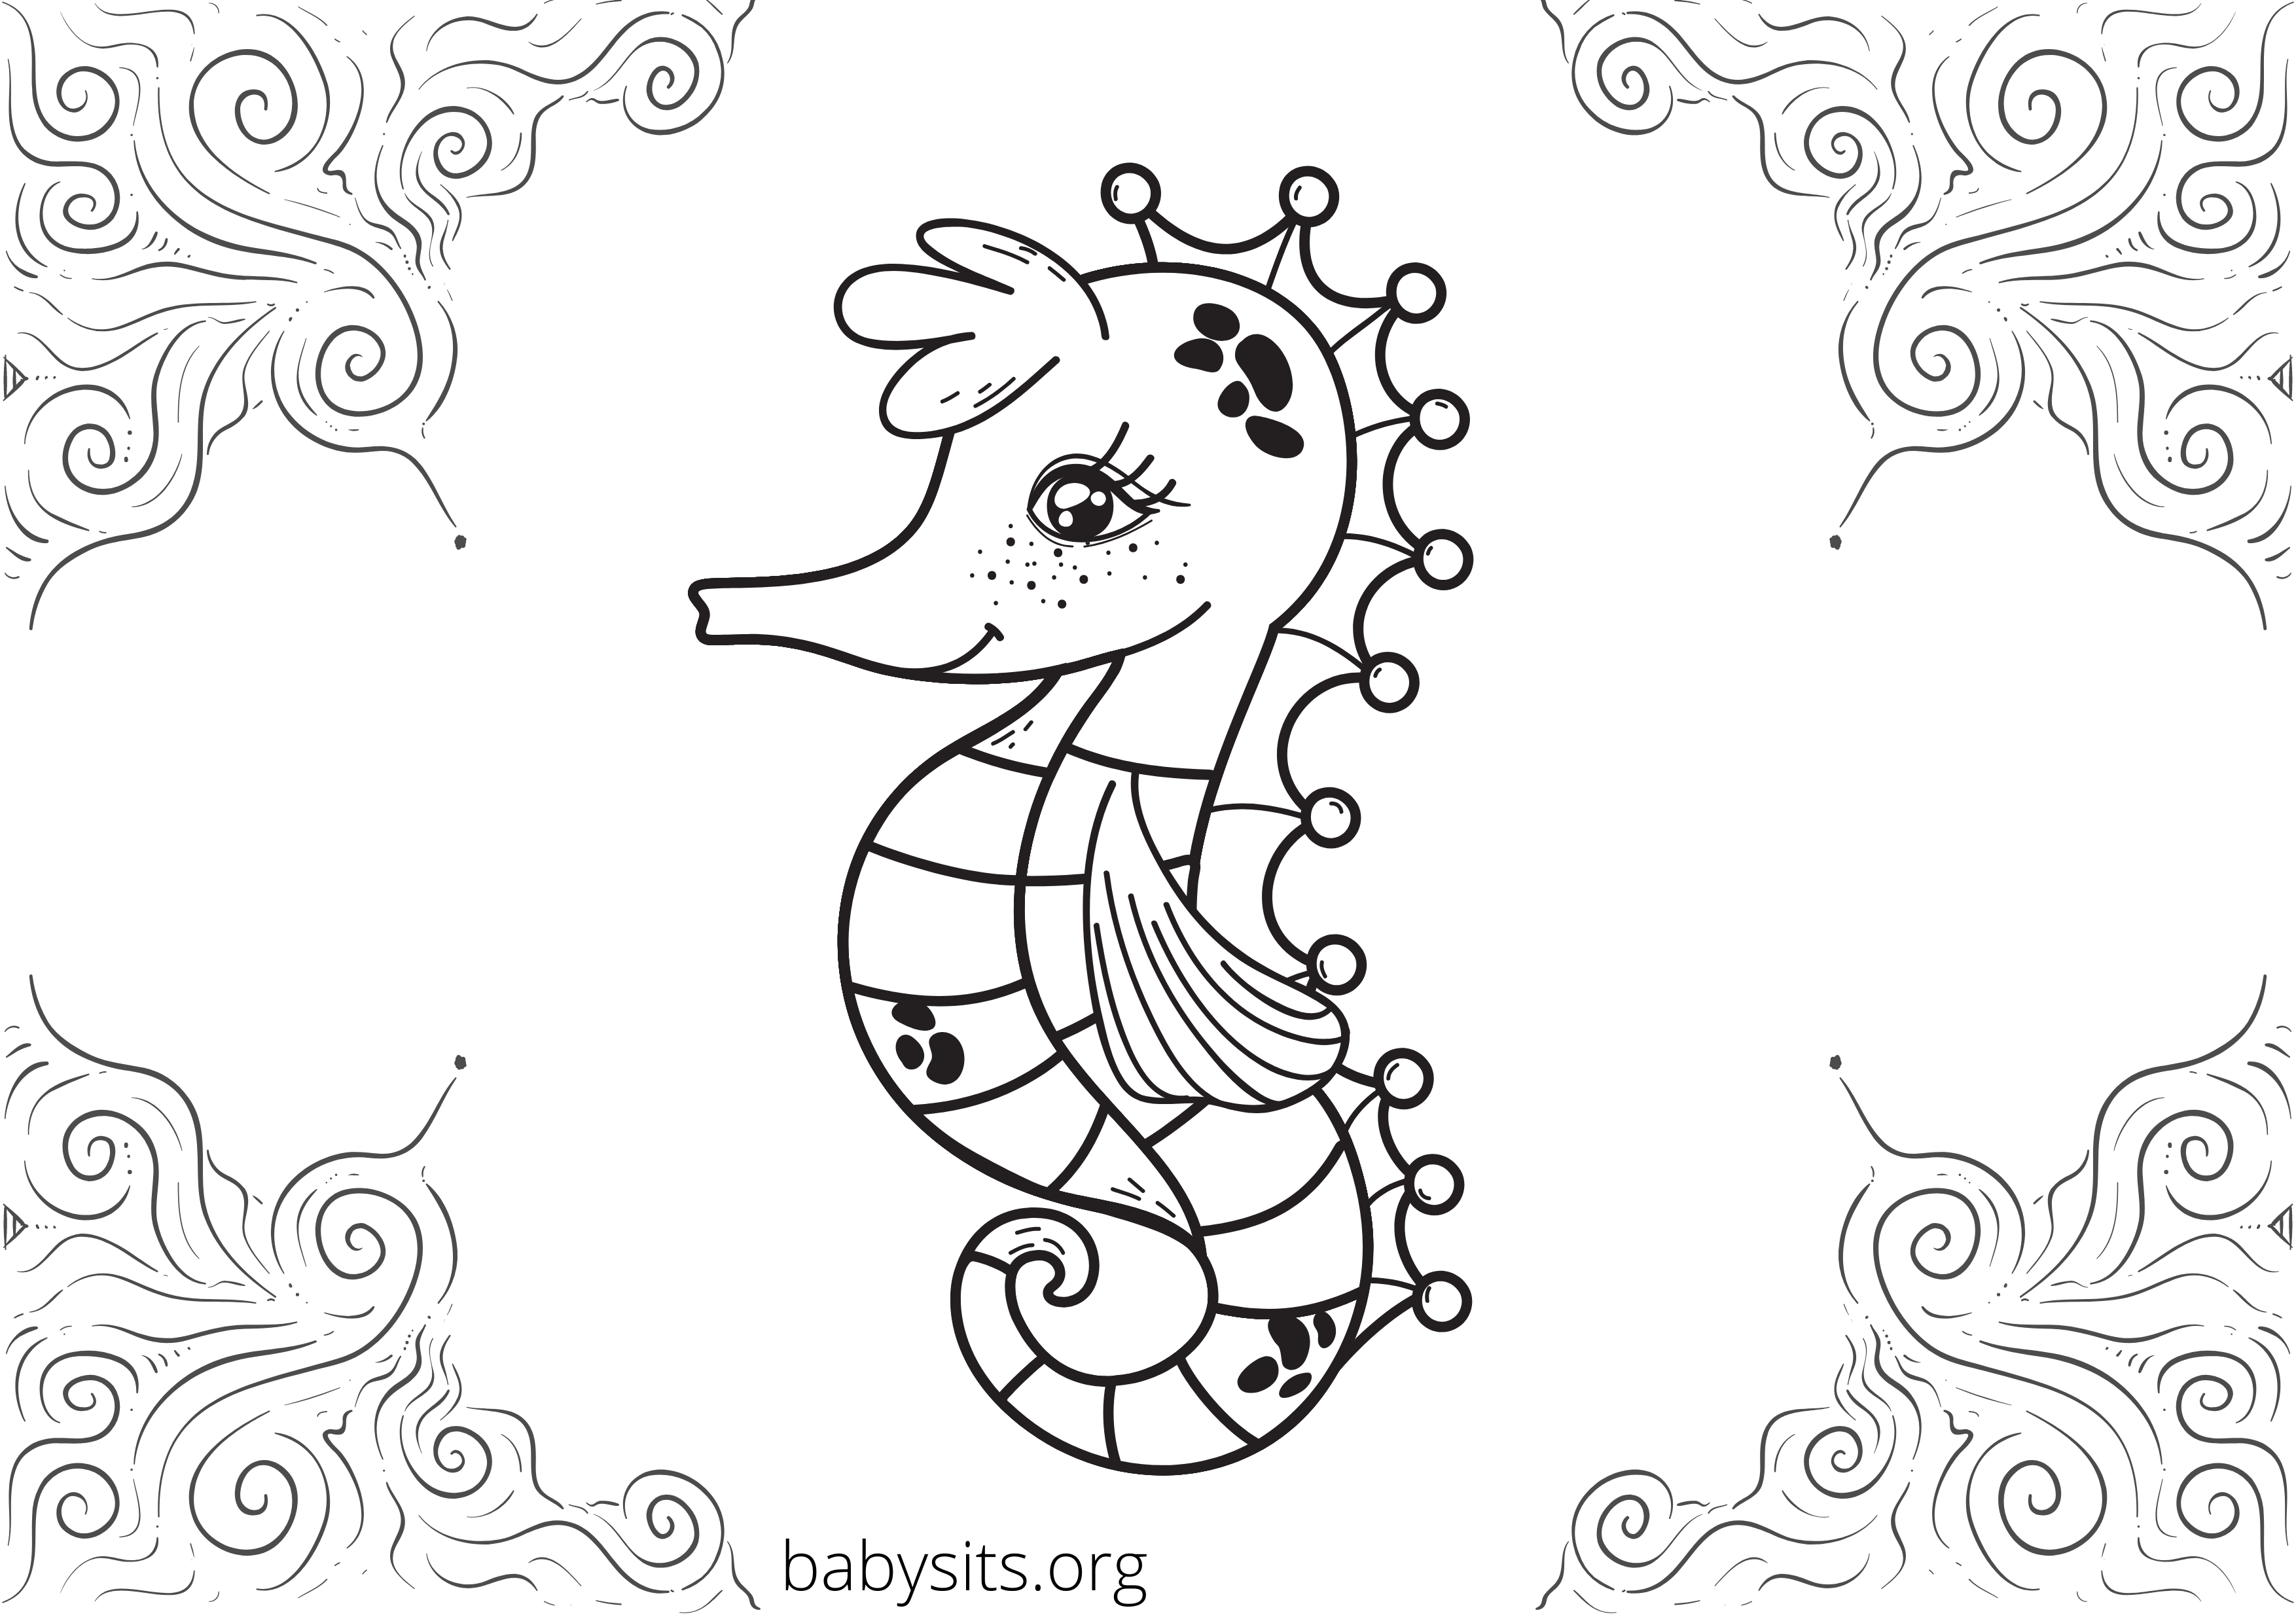 Sea horse colouring page